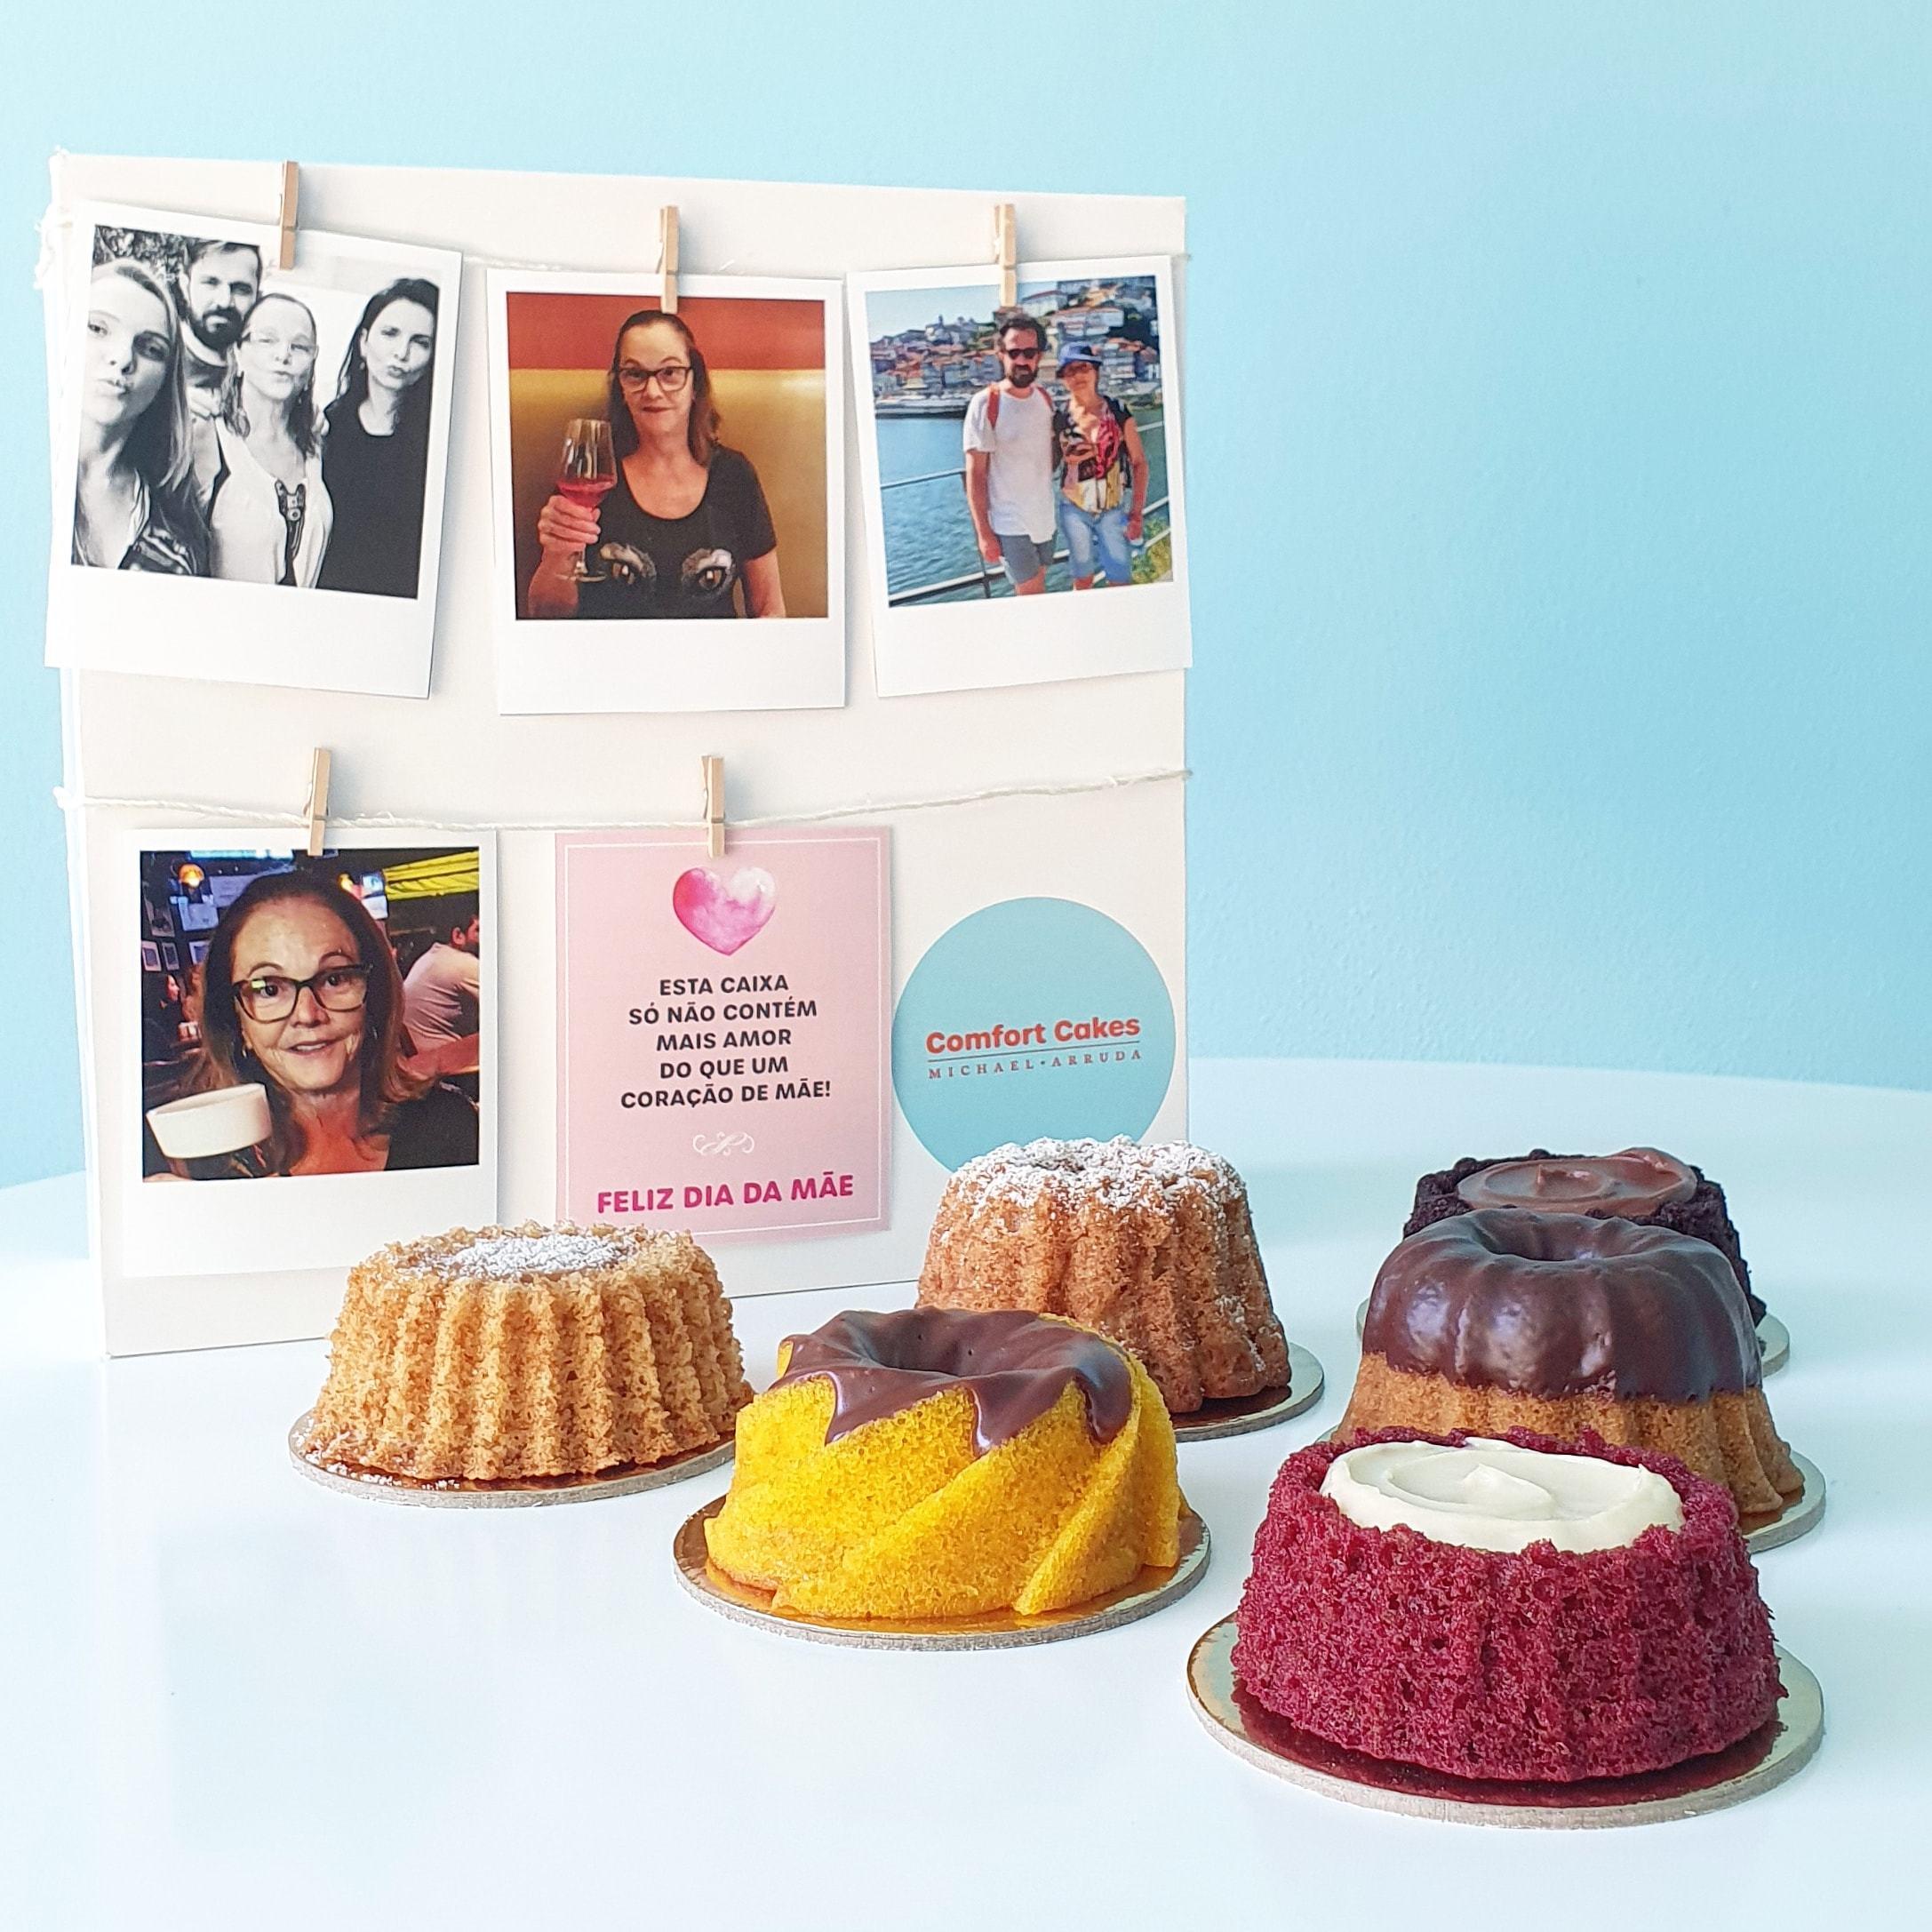 Comfort Cakes